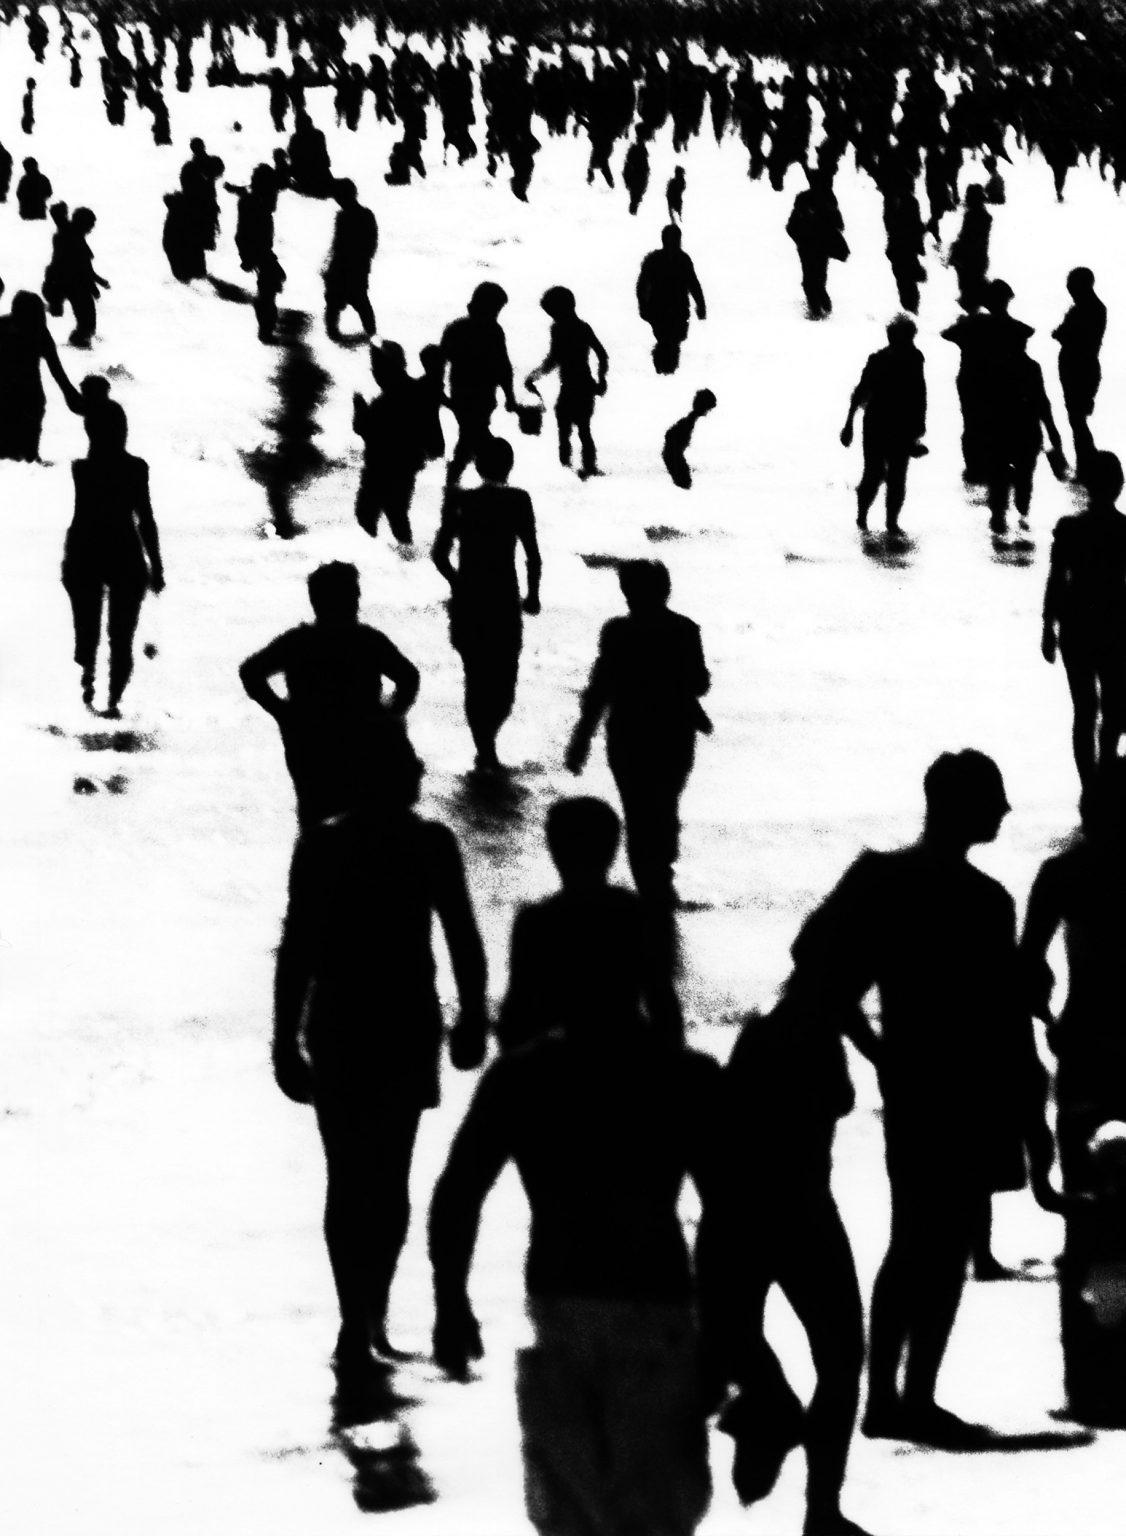 walking-towards-nothing-cammino-verso-niente